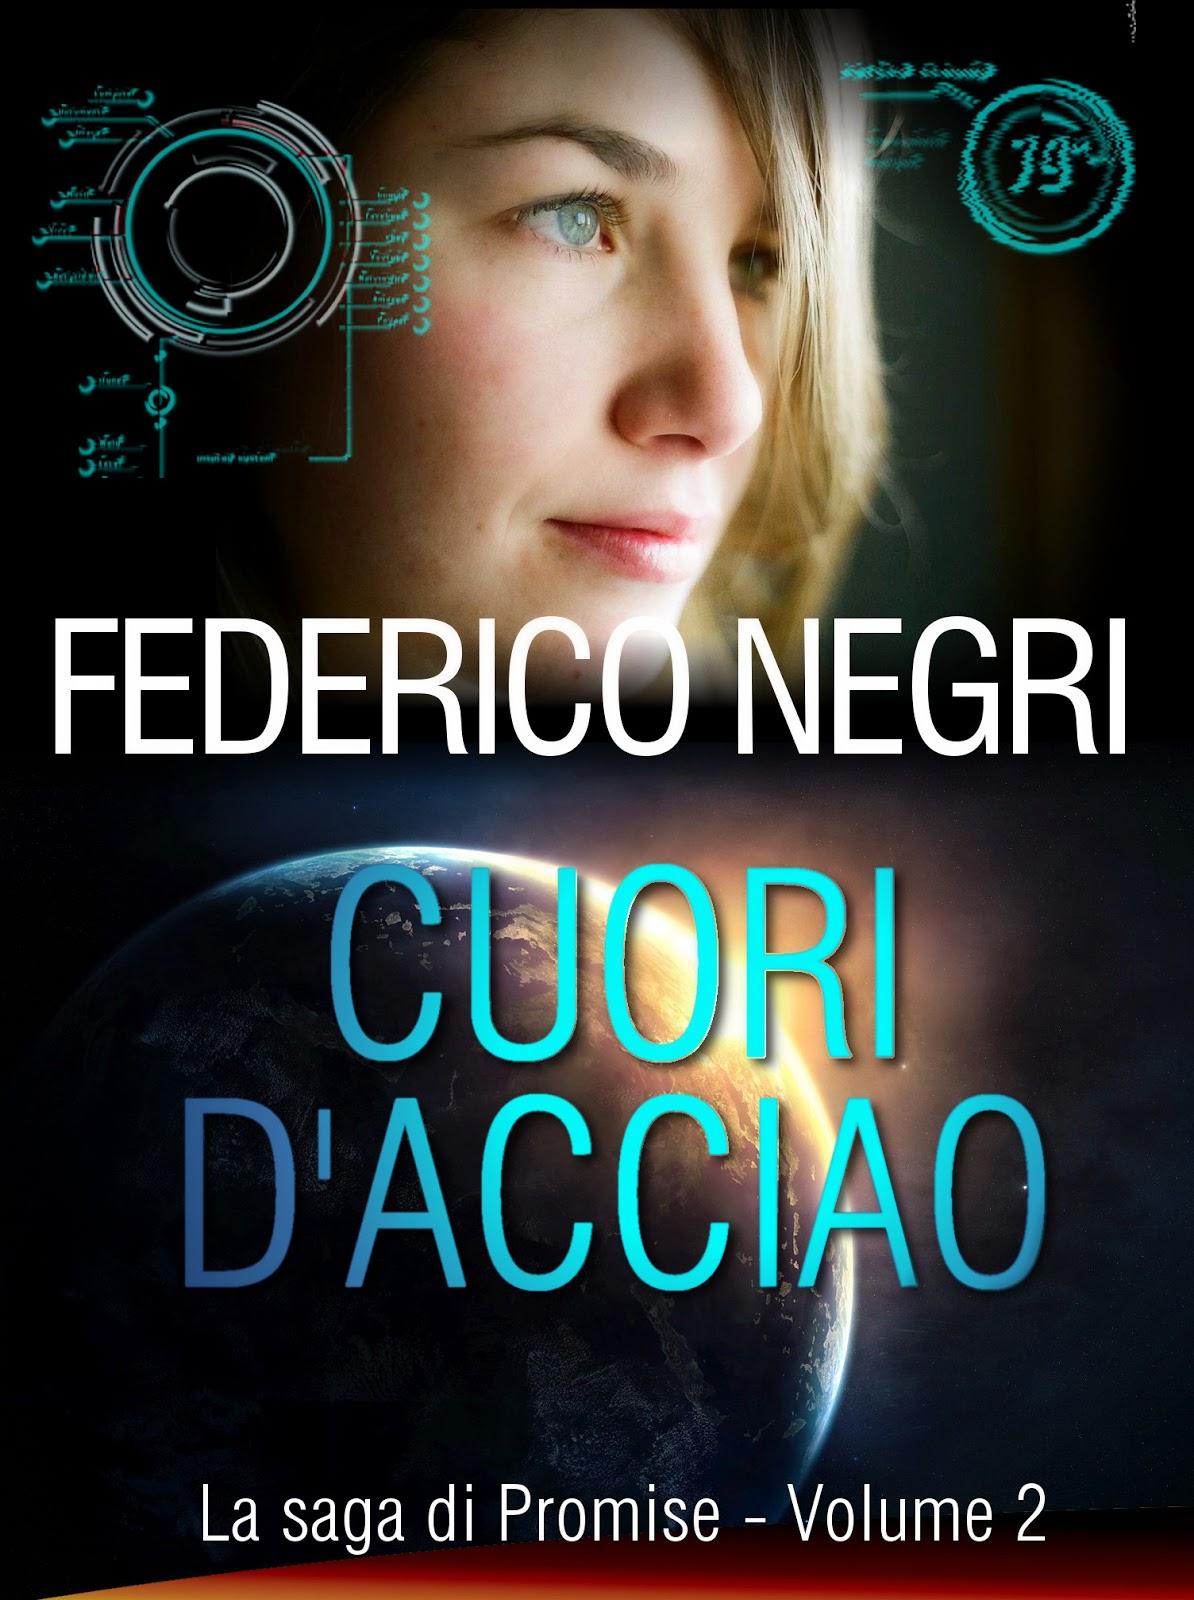 http://www.amazon.it/Cuori-dacciaio-saga-Promise-Vol-ebook/dp/B00KZ2V9NA